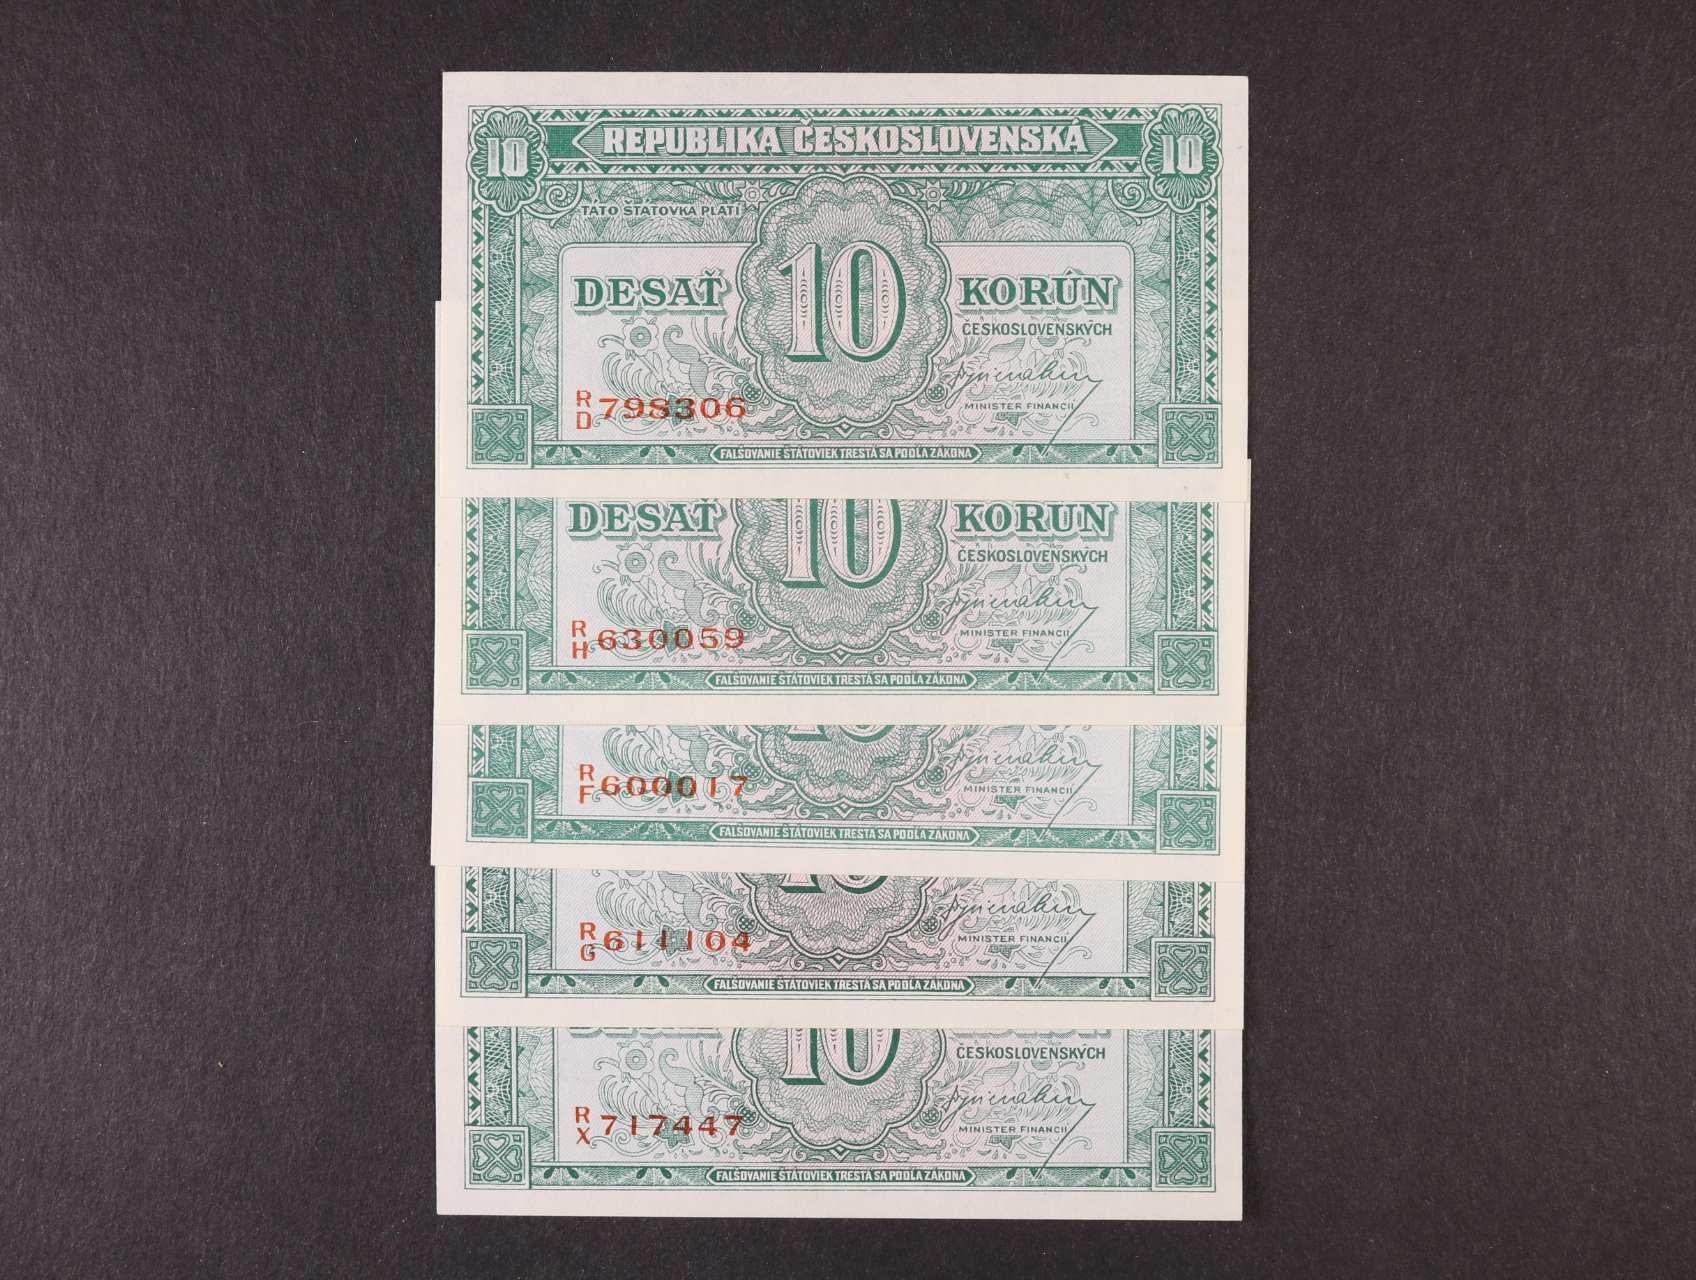 10 Kčs 1945 série R/D, R/H, R/F, R/G, R/X , Ba. 71, Pi. 60a, 5ks